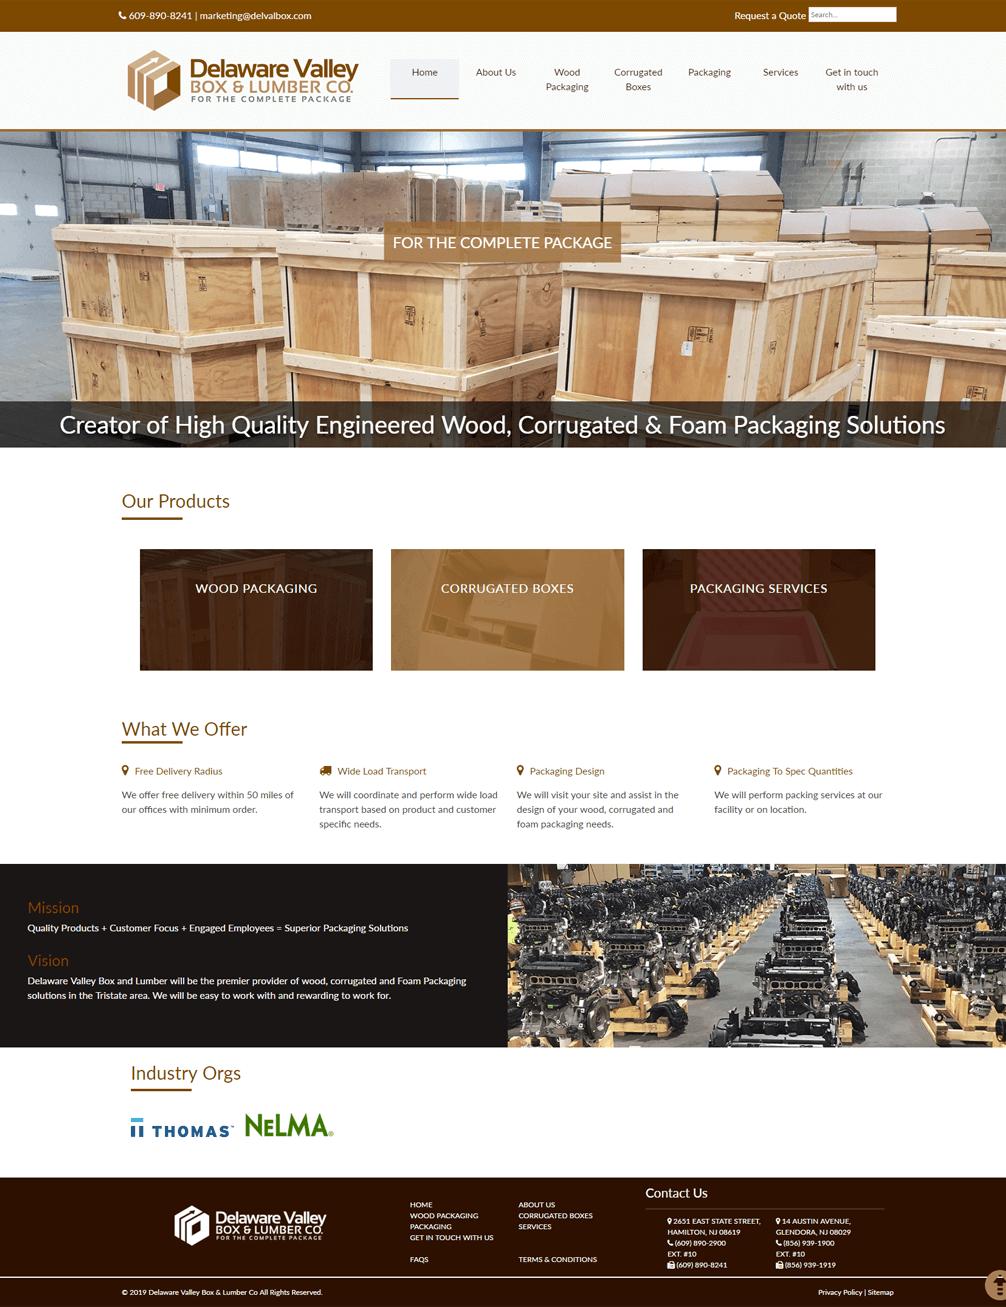 Delaware-Valley-Box-Lumber-Co